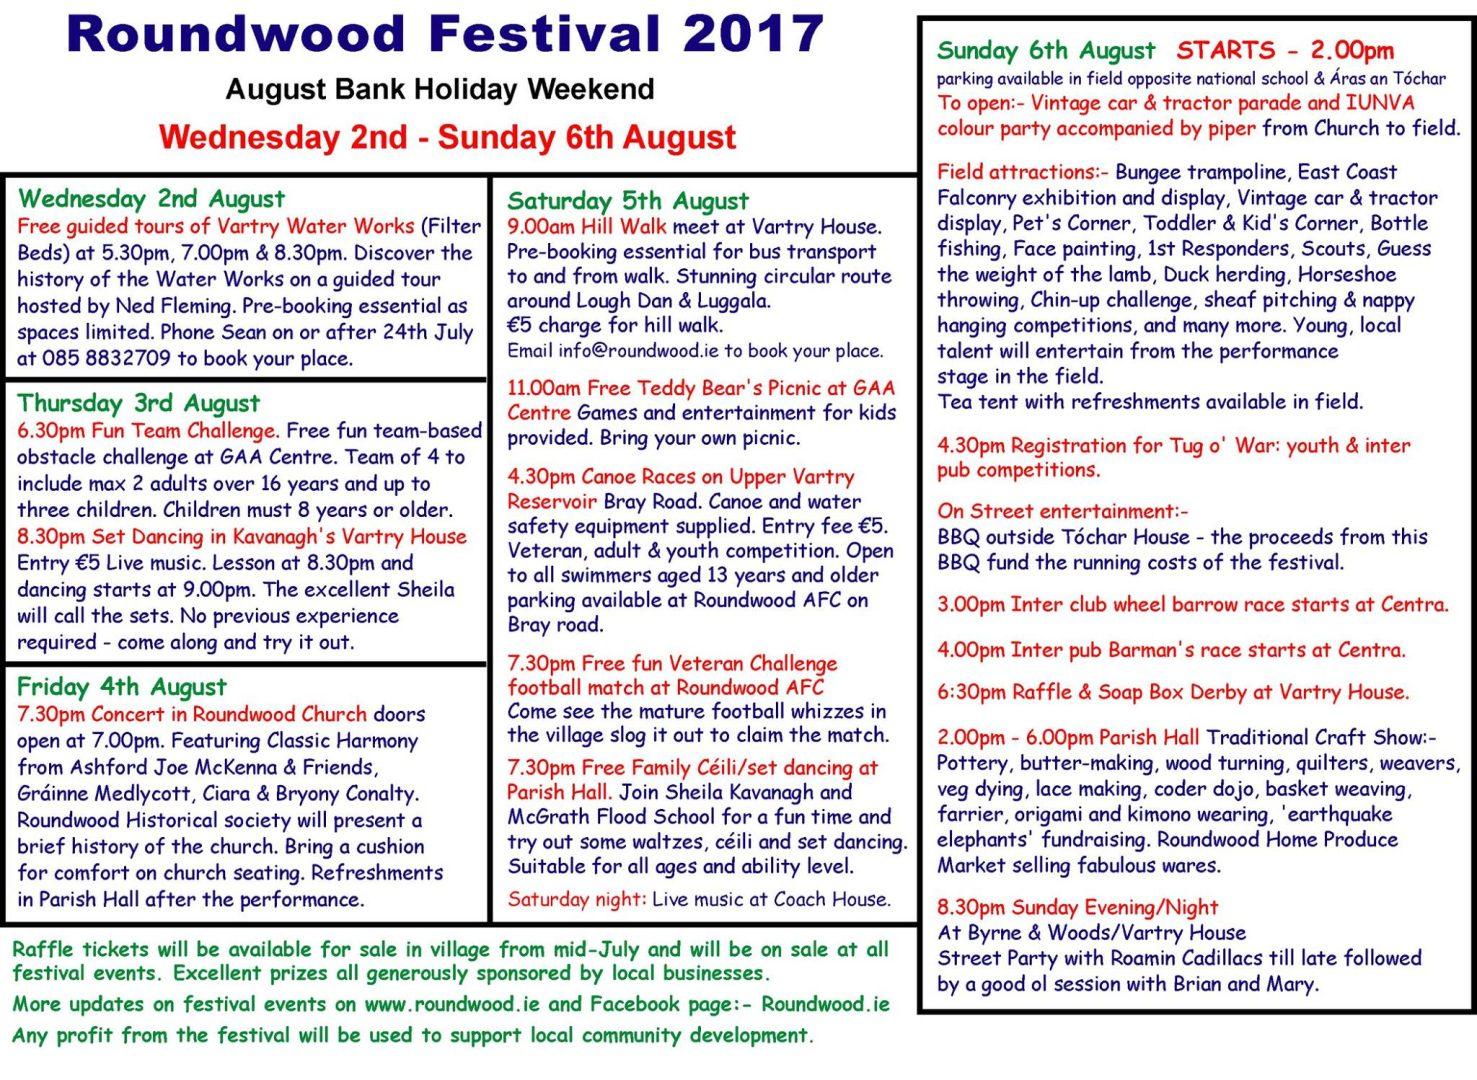 Roundwood Festival